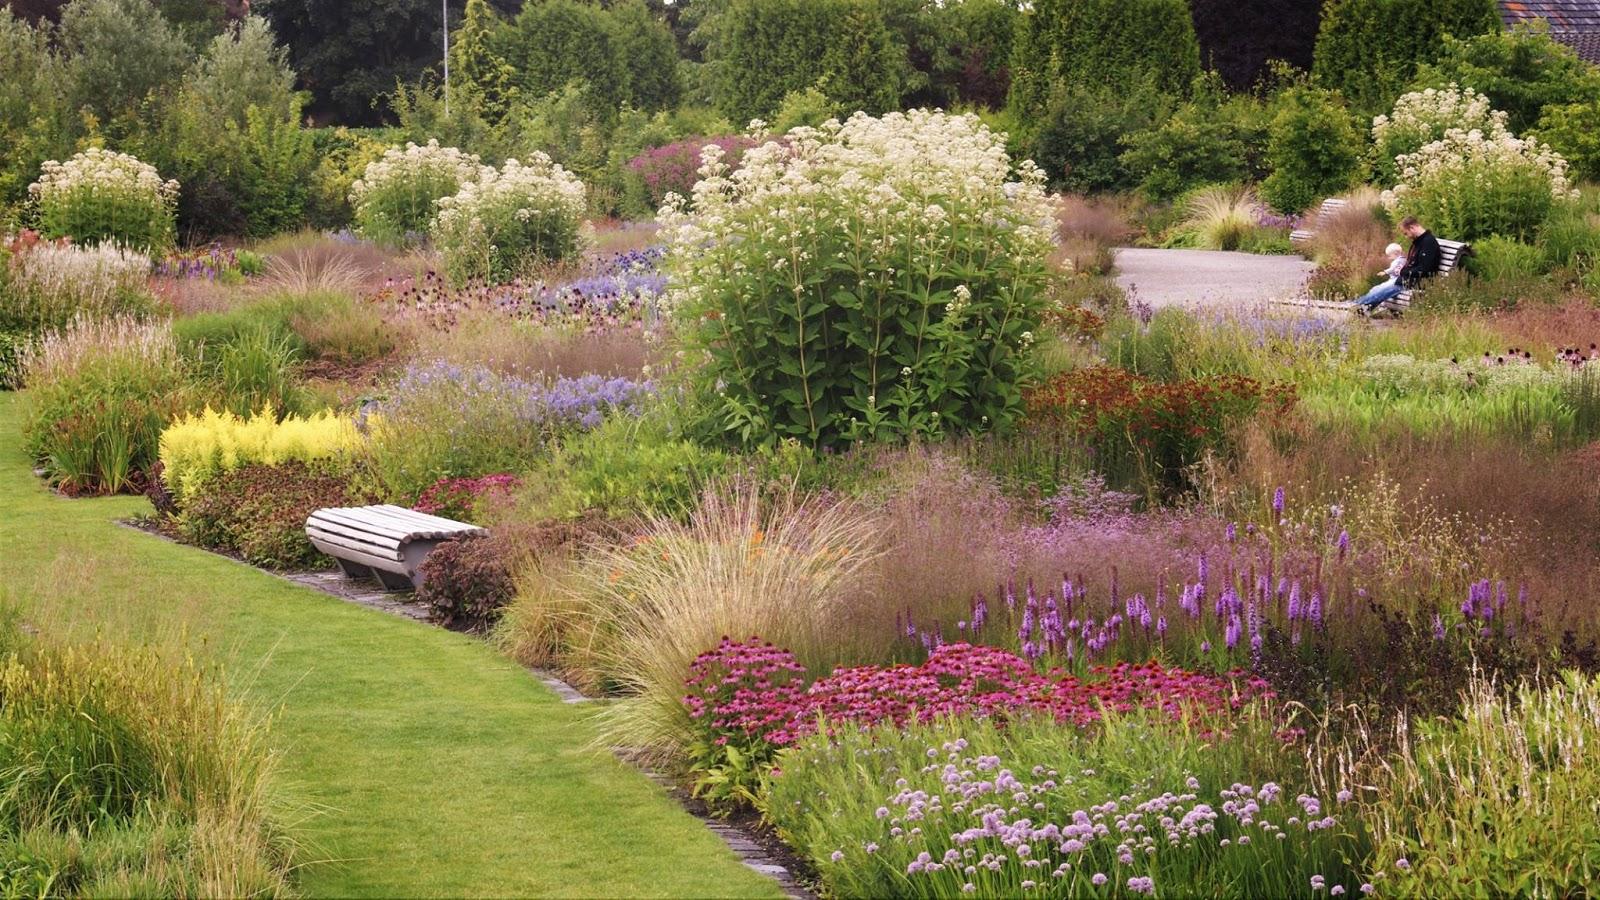 Jardín comunitario en Utrech diseñado por Piet Oudolf